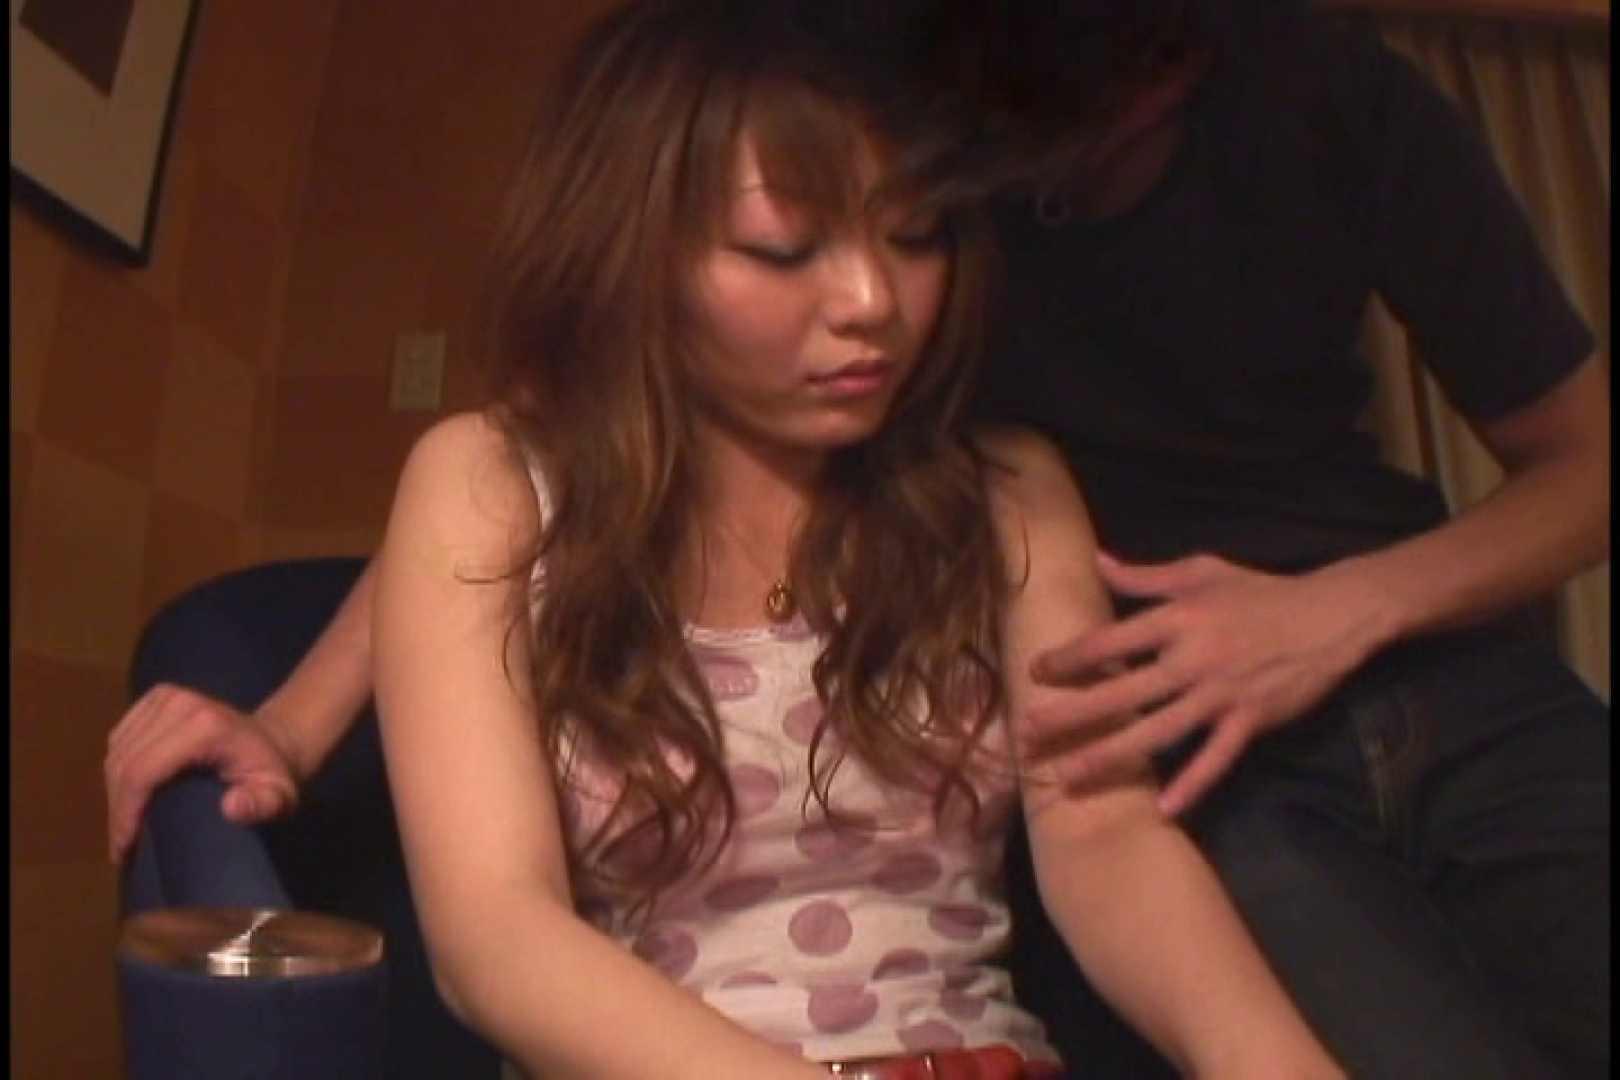 JDハンター全国ツアー vol.001 前編 美しいOLの裸体   女子大生丸裸  92pic 73